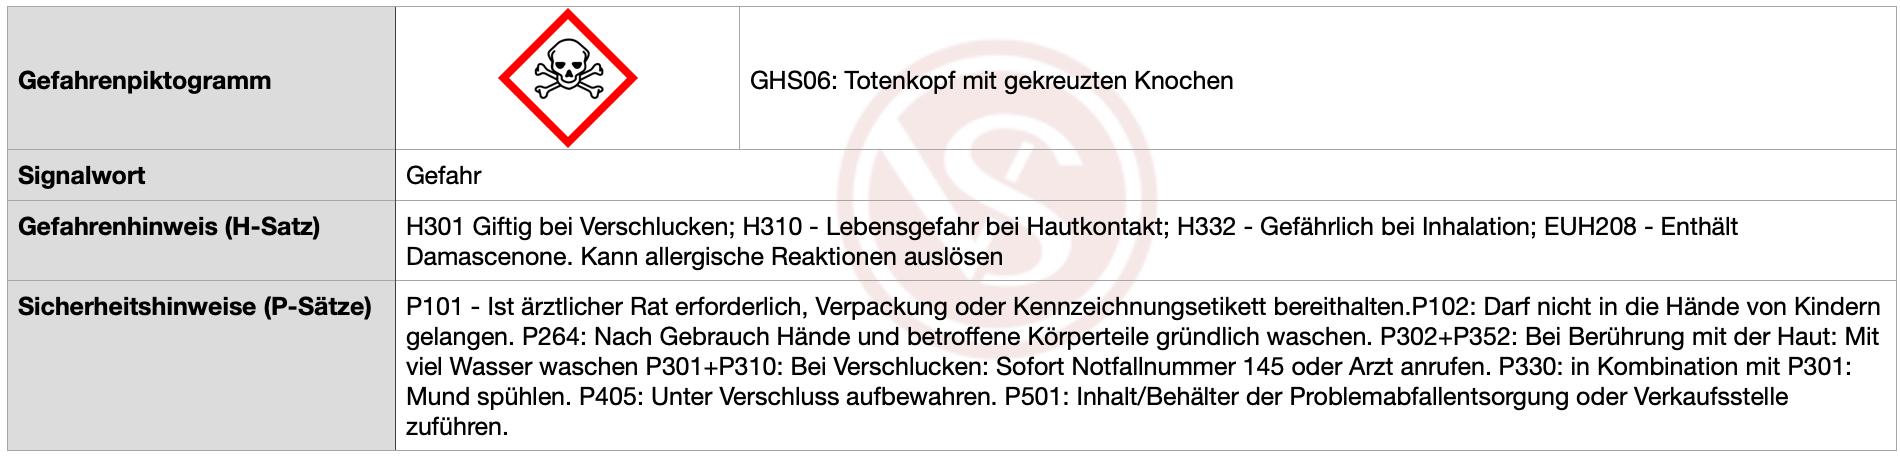 Gefahr_H301_H311_H332_EUH208_Damascenone